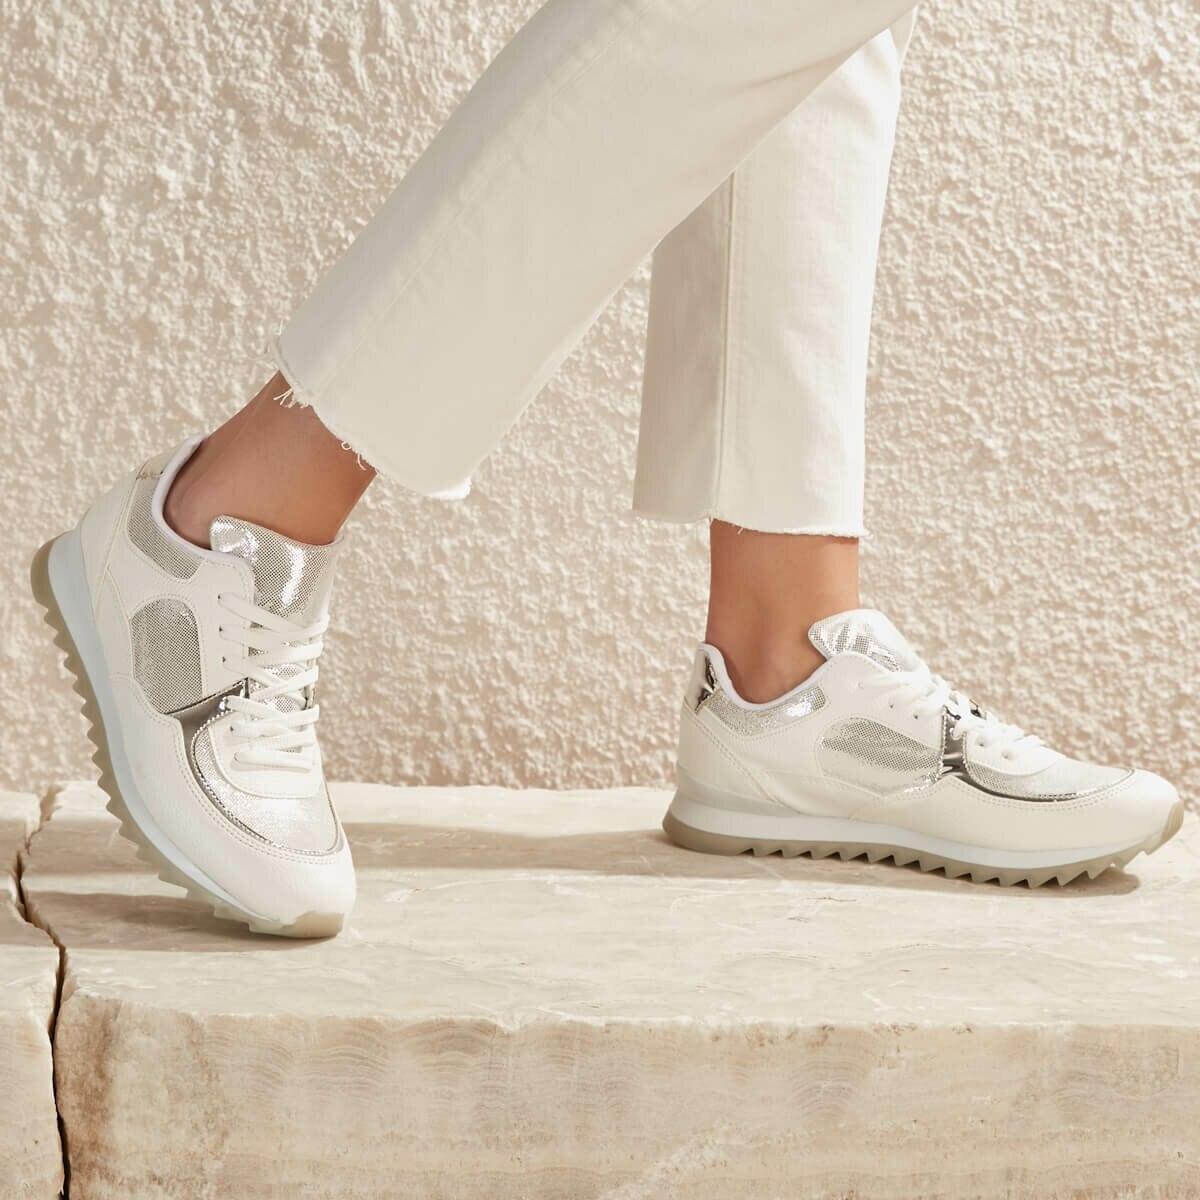 FLO BASTEN01Z SKIN White Women 'S Sneaker Shoes BUTIGO